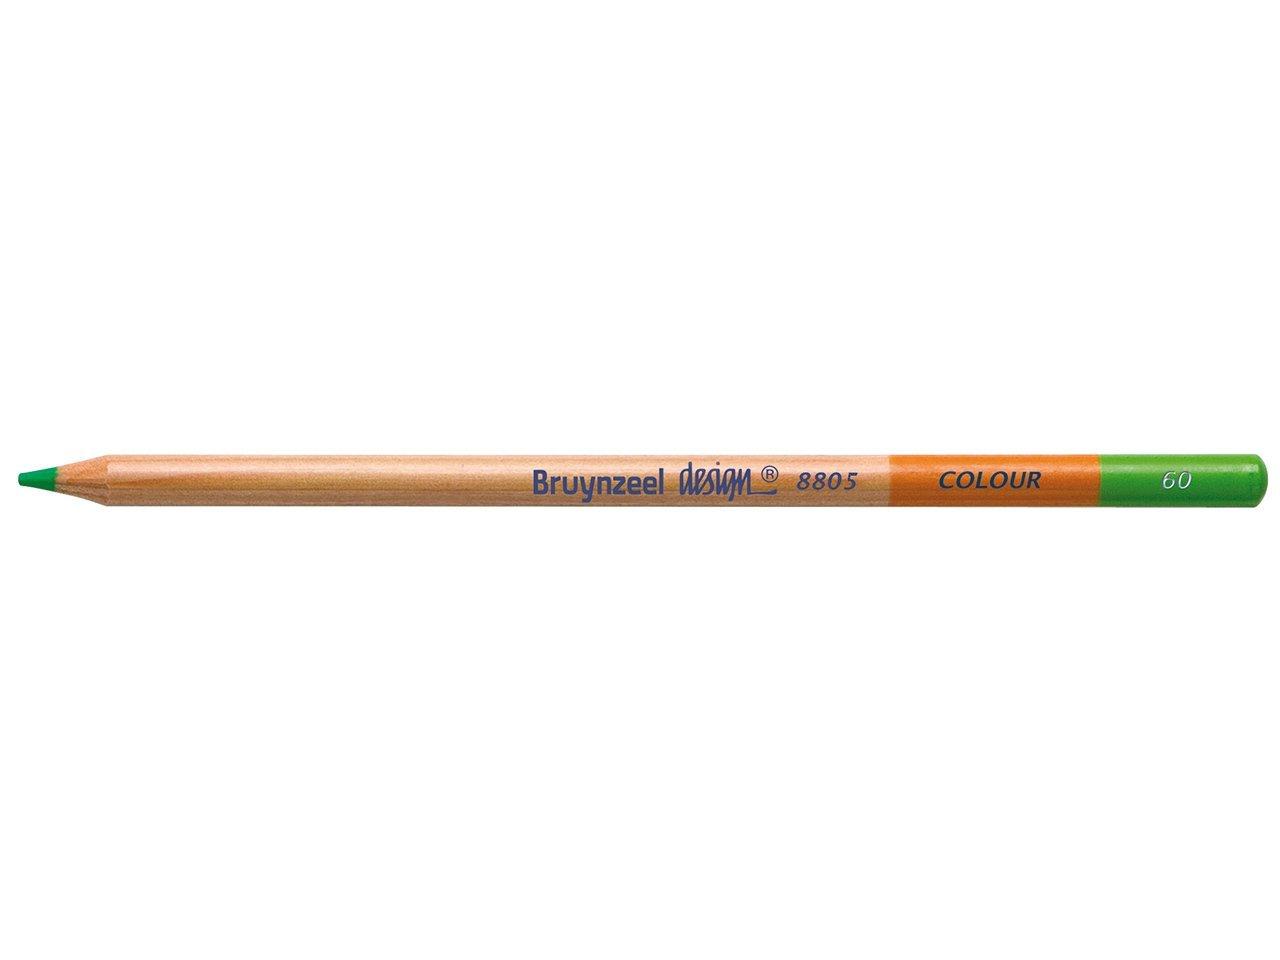 Bruynzeel Pencil - 60 Light Green